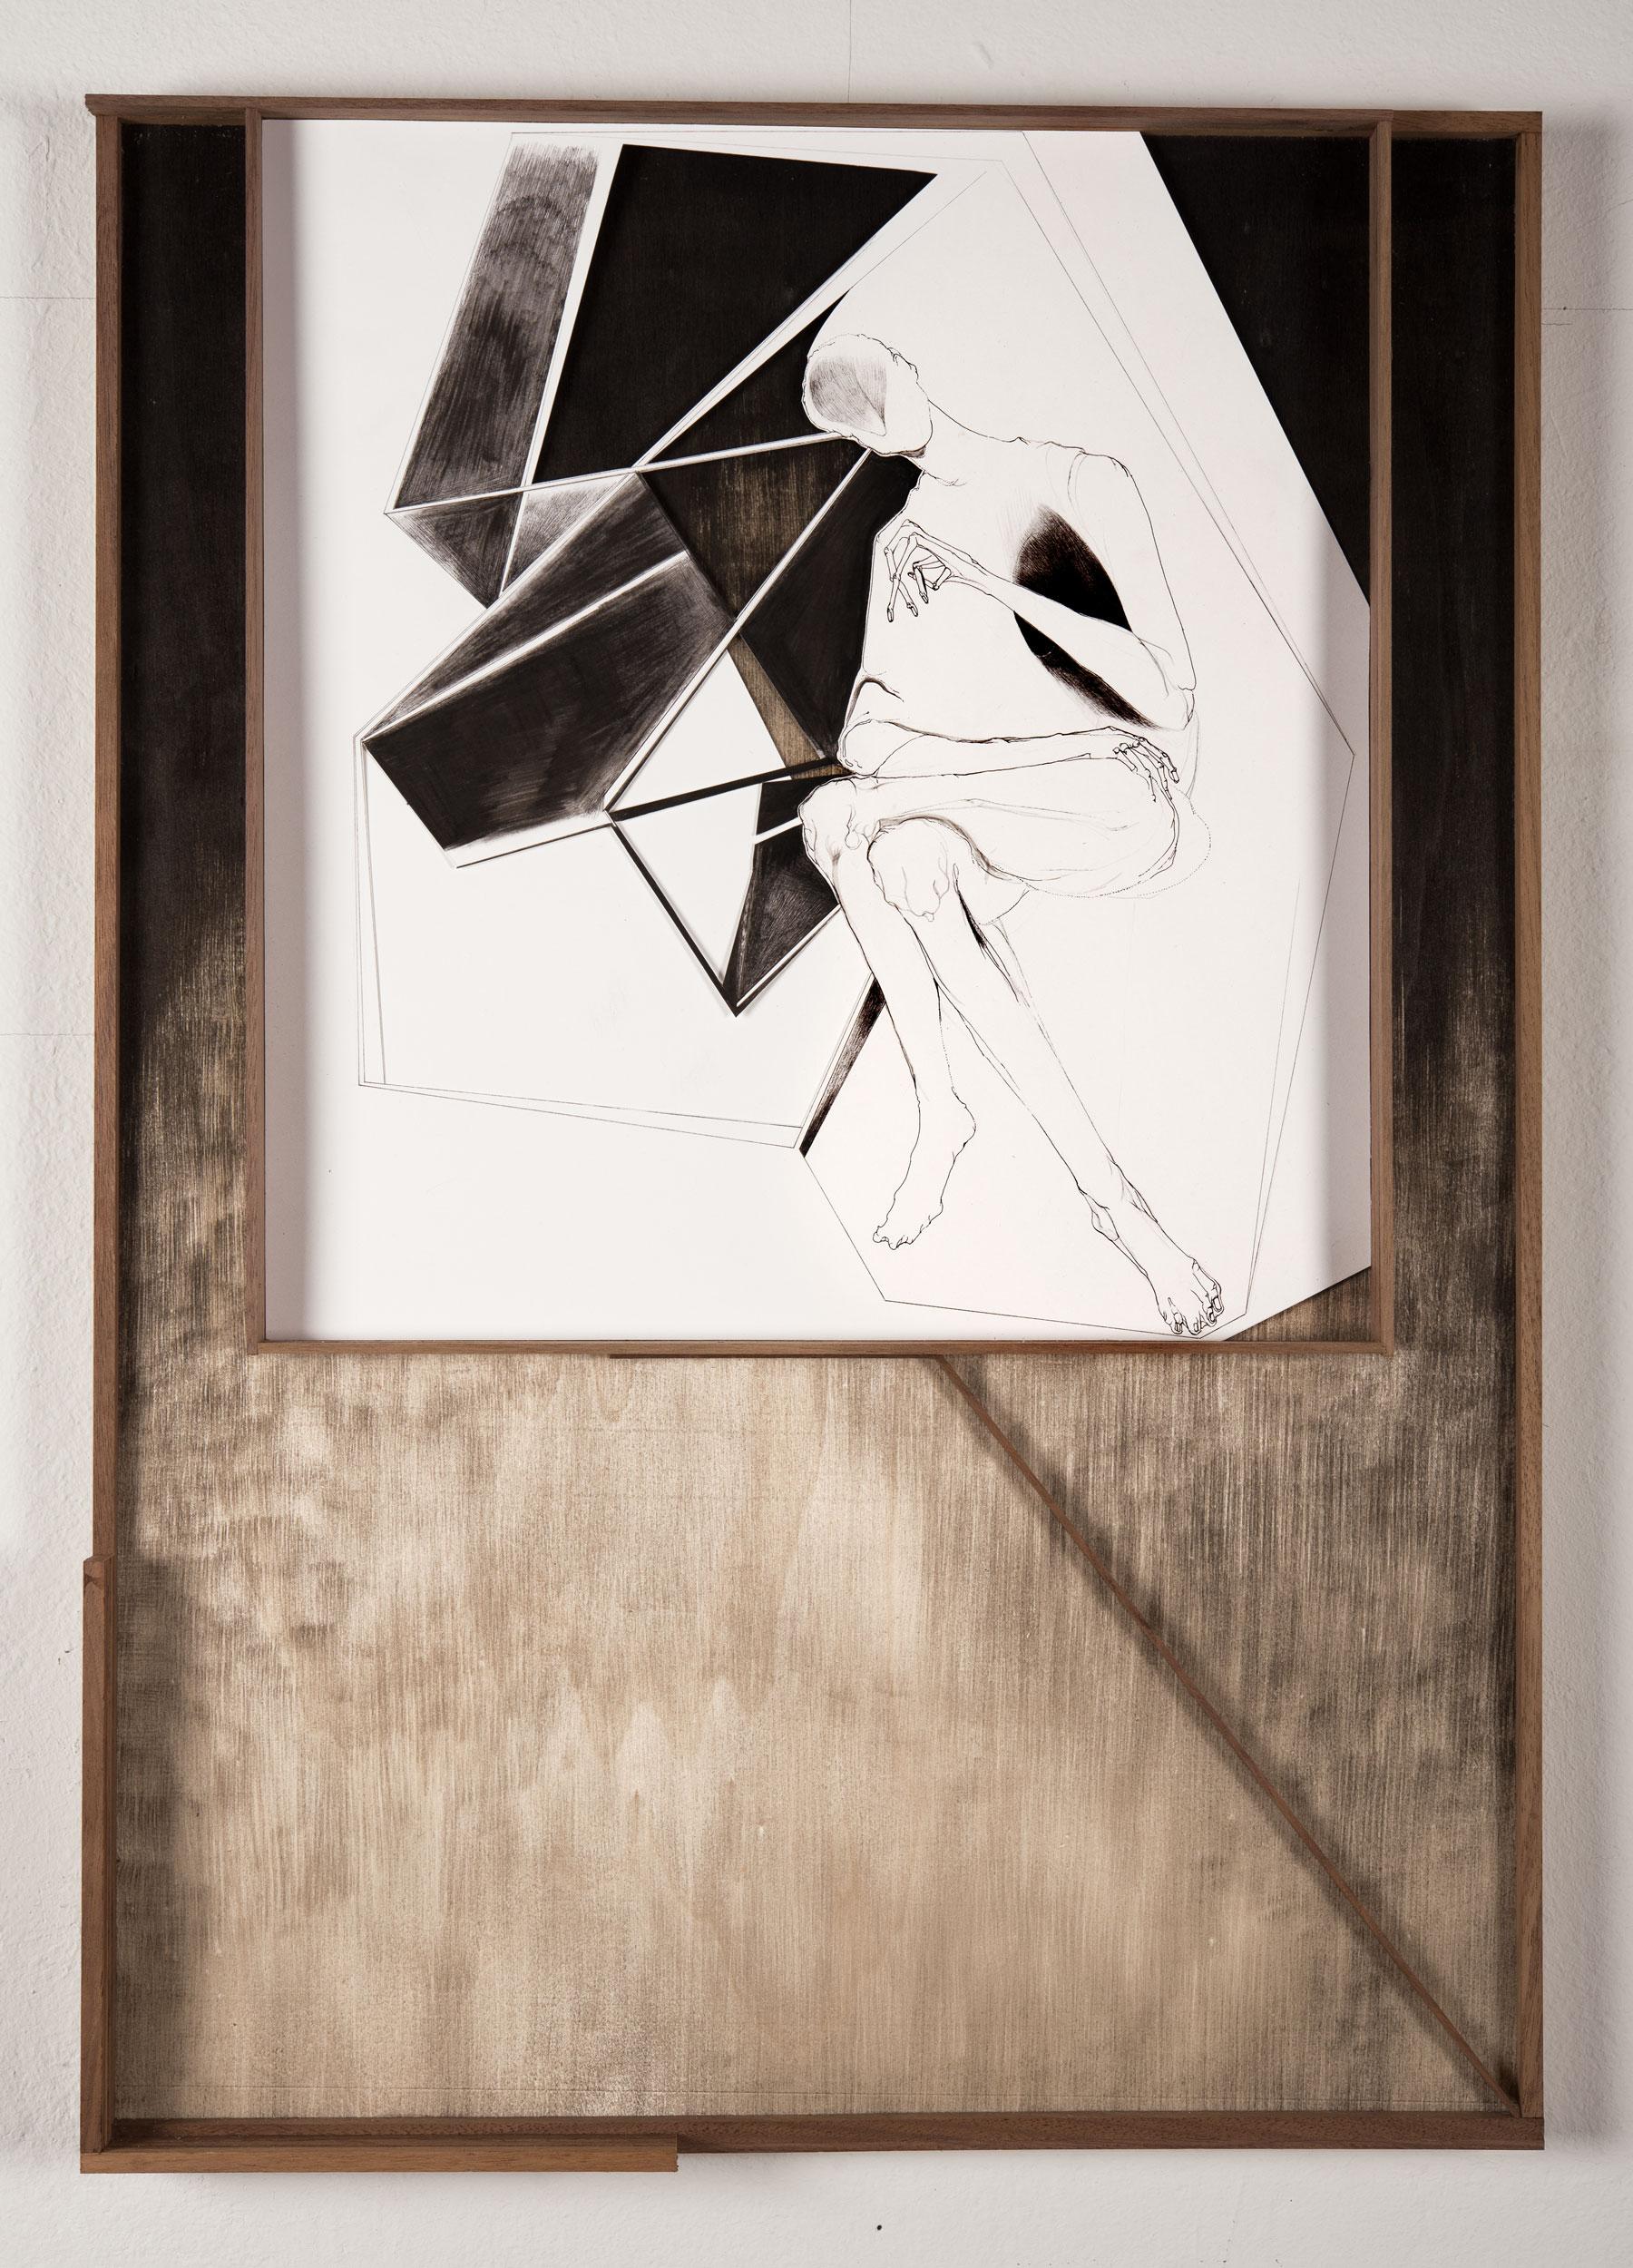 Nina Annabelle Märkl | Modell Nummer 1 | Ink on paper Cut Outs wood black paper | 59 x 42 cm | 2014